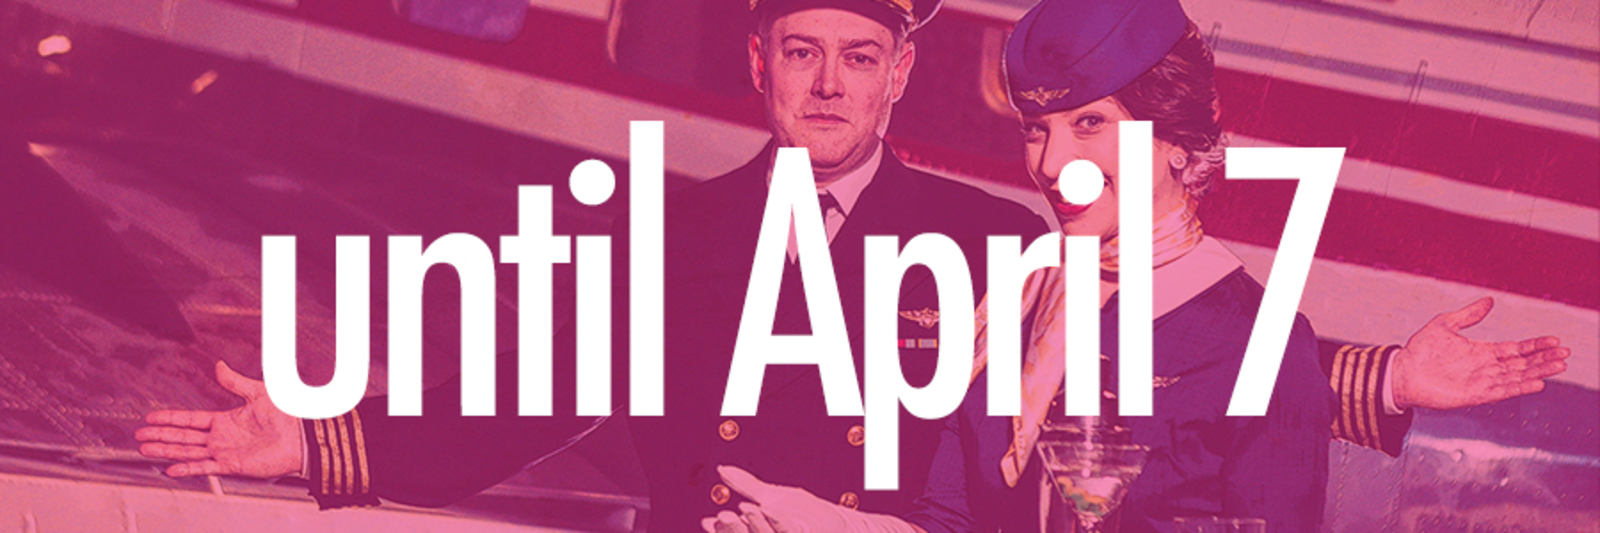 Normal2x until april 7 events sara kalke citadel theatre yegarts yeg edmonton yes slight of mind   pink